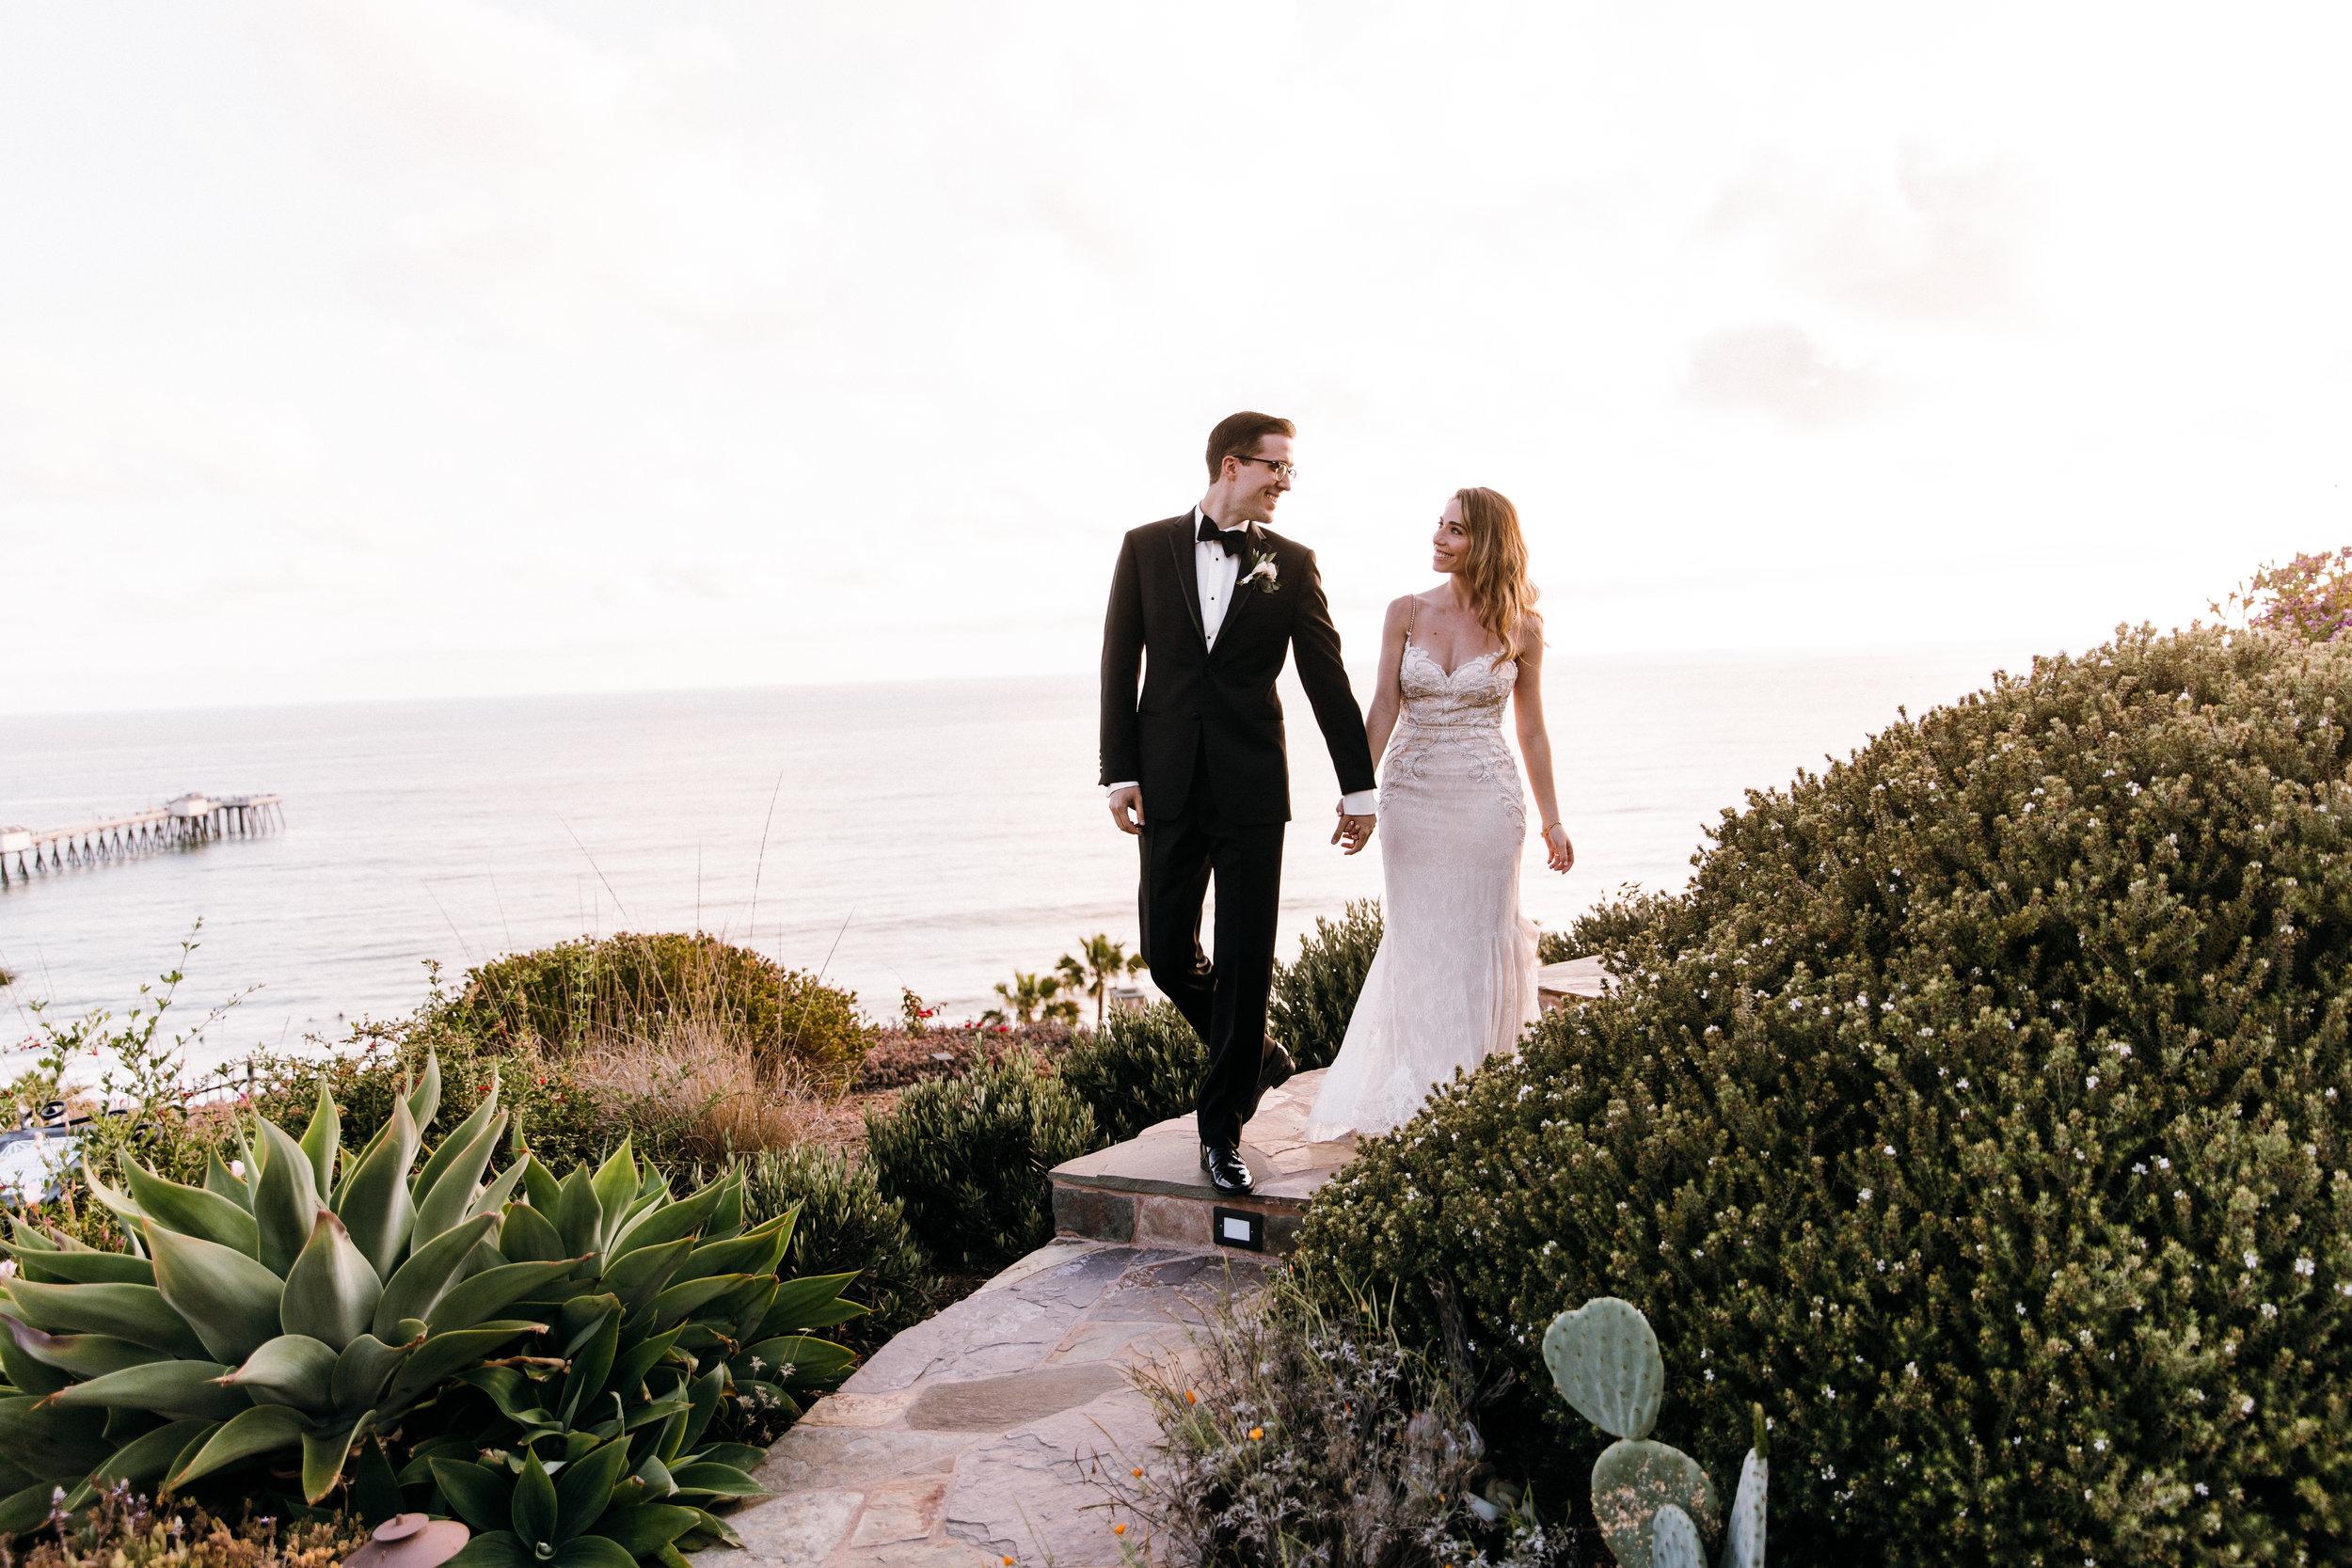 OC WEDDING PHOTOGRAPHER, SOUTHERN CALIFORNIA WEDDING PHOTOGRAPHER, ORANGE COUNTY WEDDING PHOTOGRAPHER, SOCAL WEDDING PHOTOGRAPHER, SAN CLEMENTE WEDDING PHOTOGRAPHER, CASA ROMANTICA WEDDING